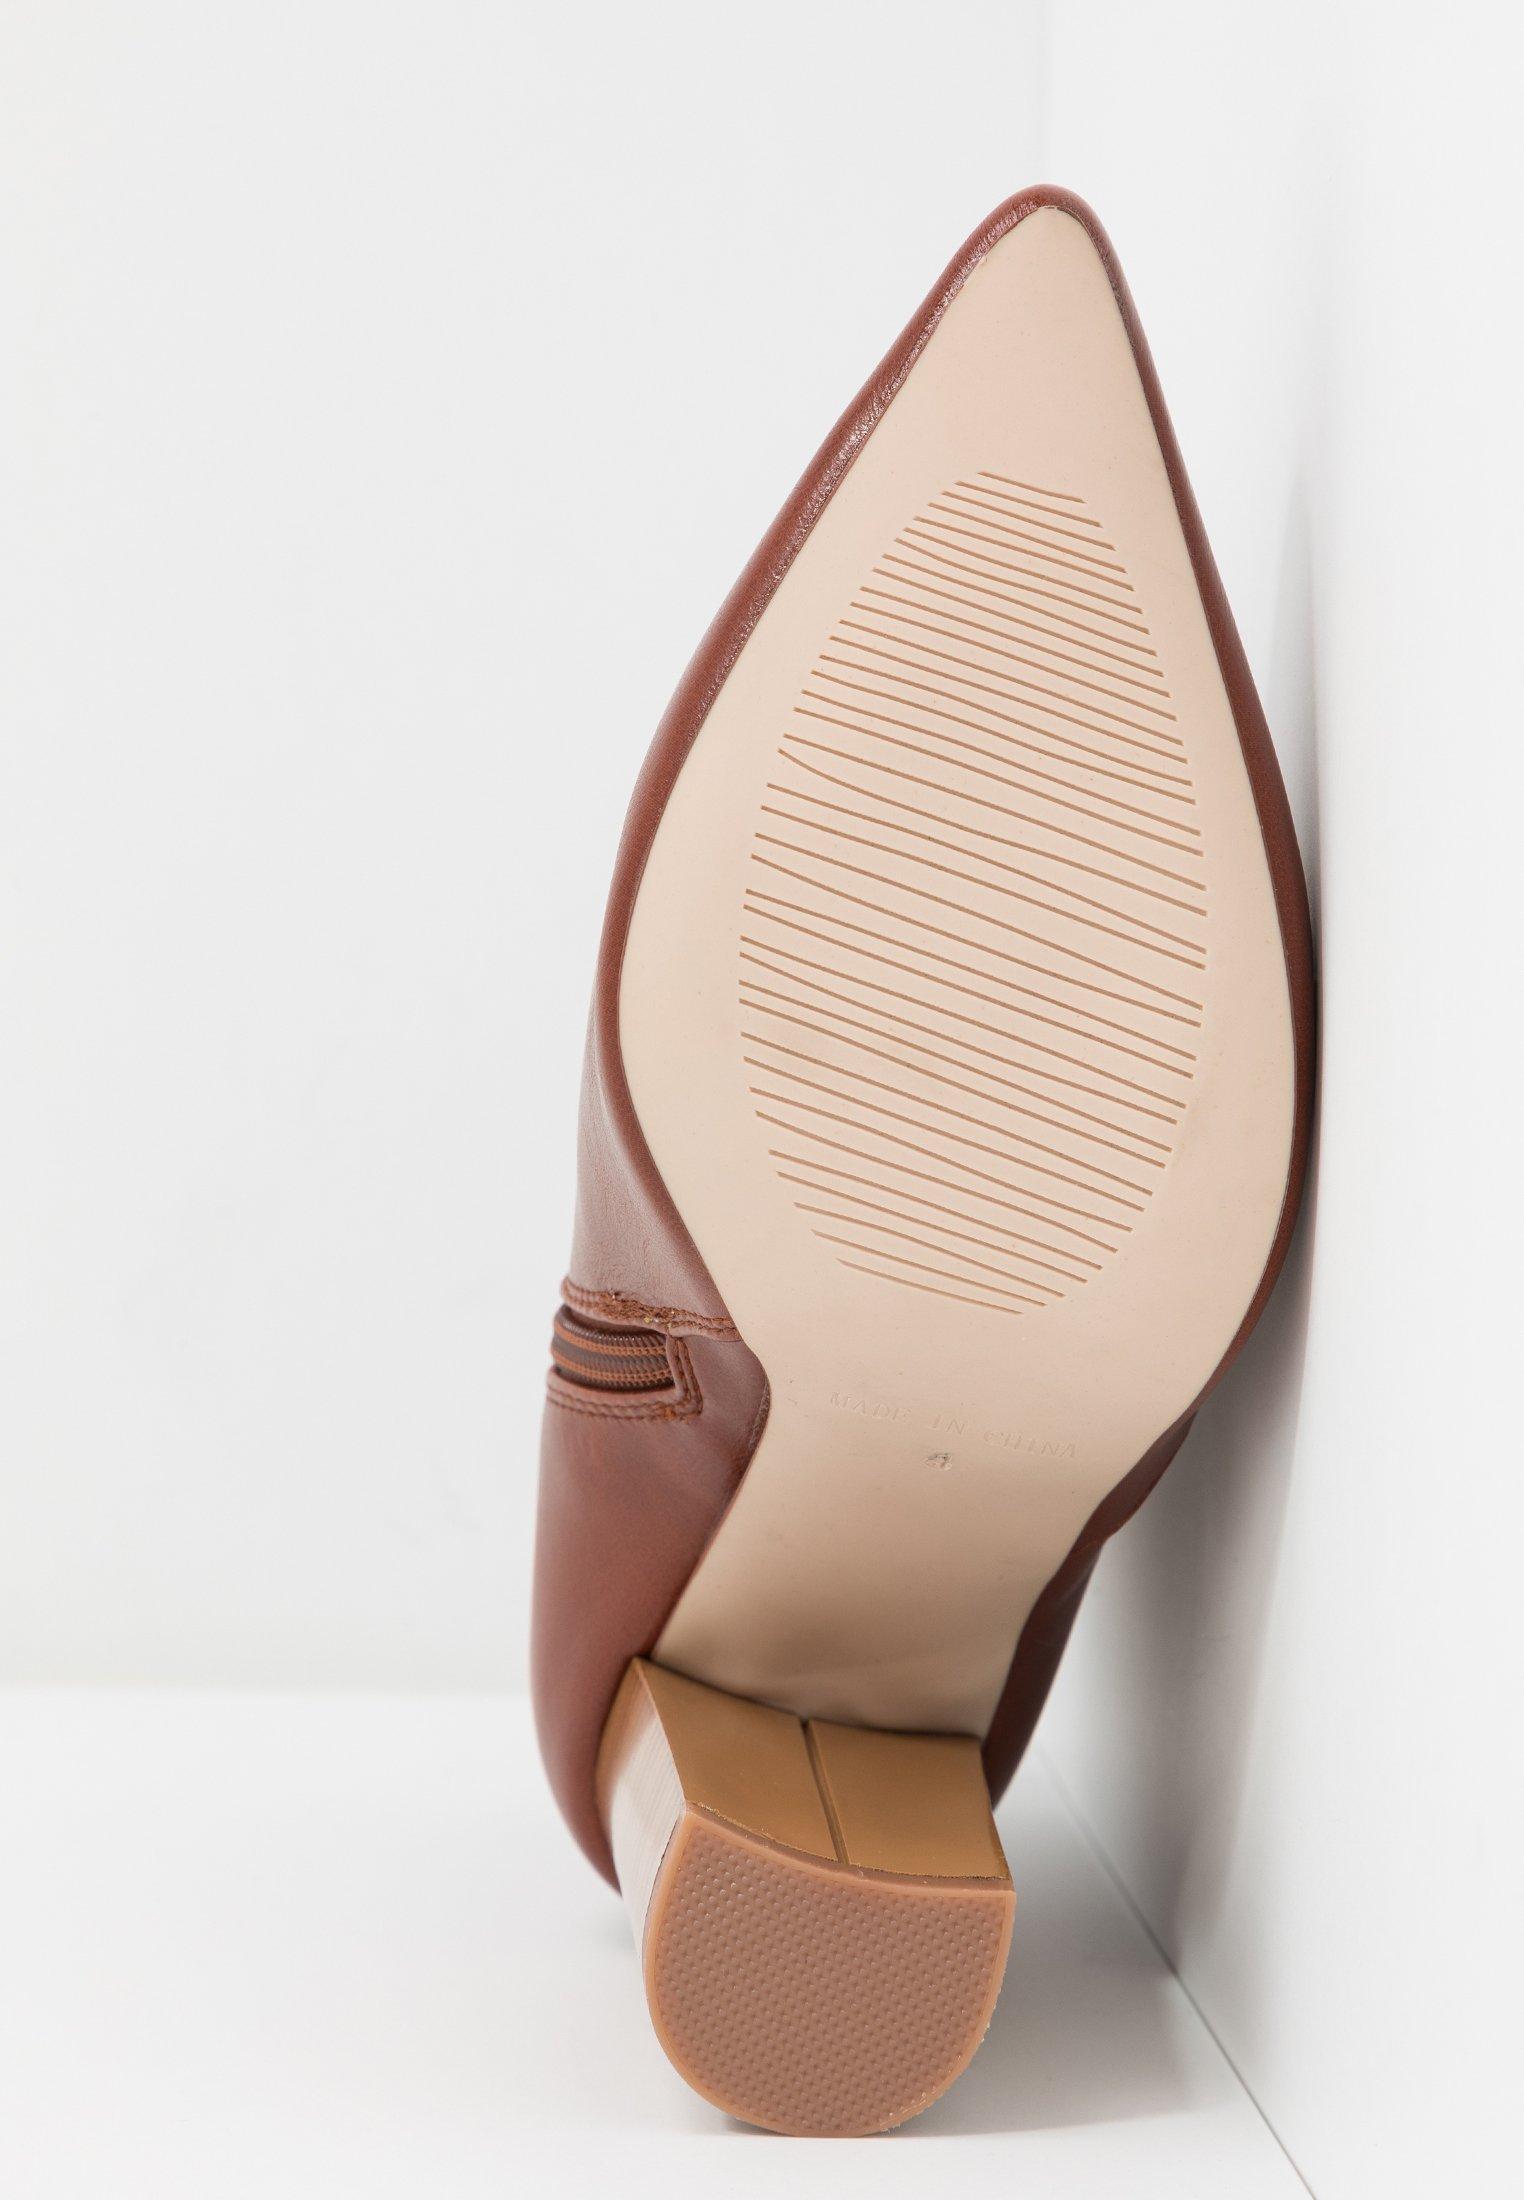 2013 Cheapest RAID KEYLA - High heeled ankle boots - tan | women's shoes 2020 7x5q6